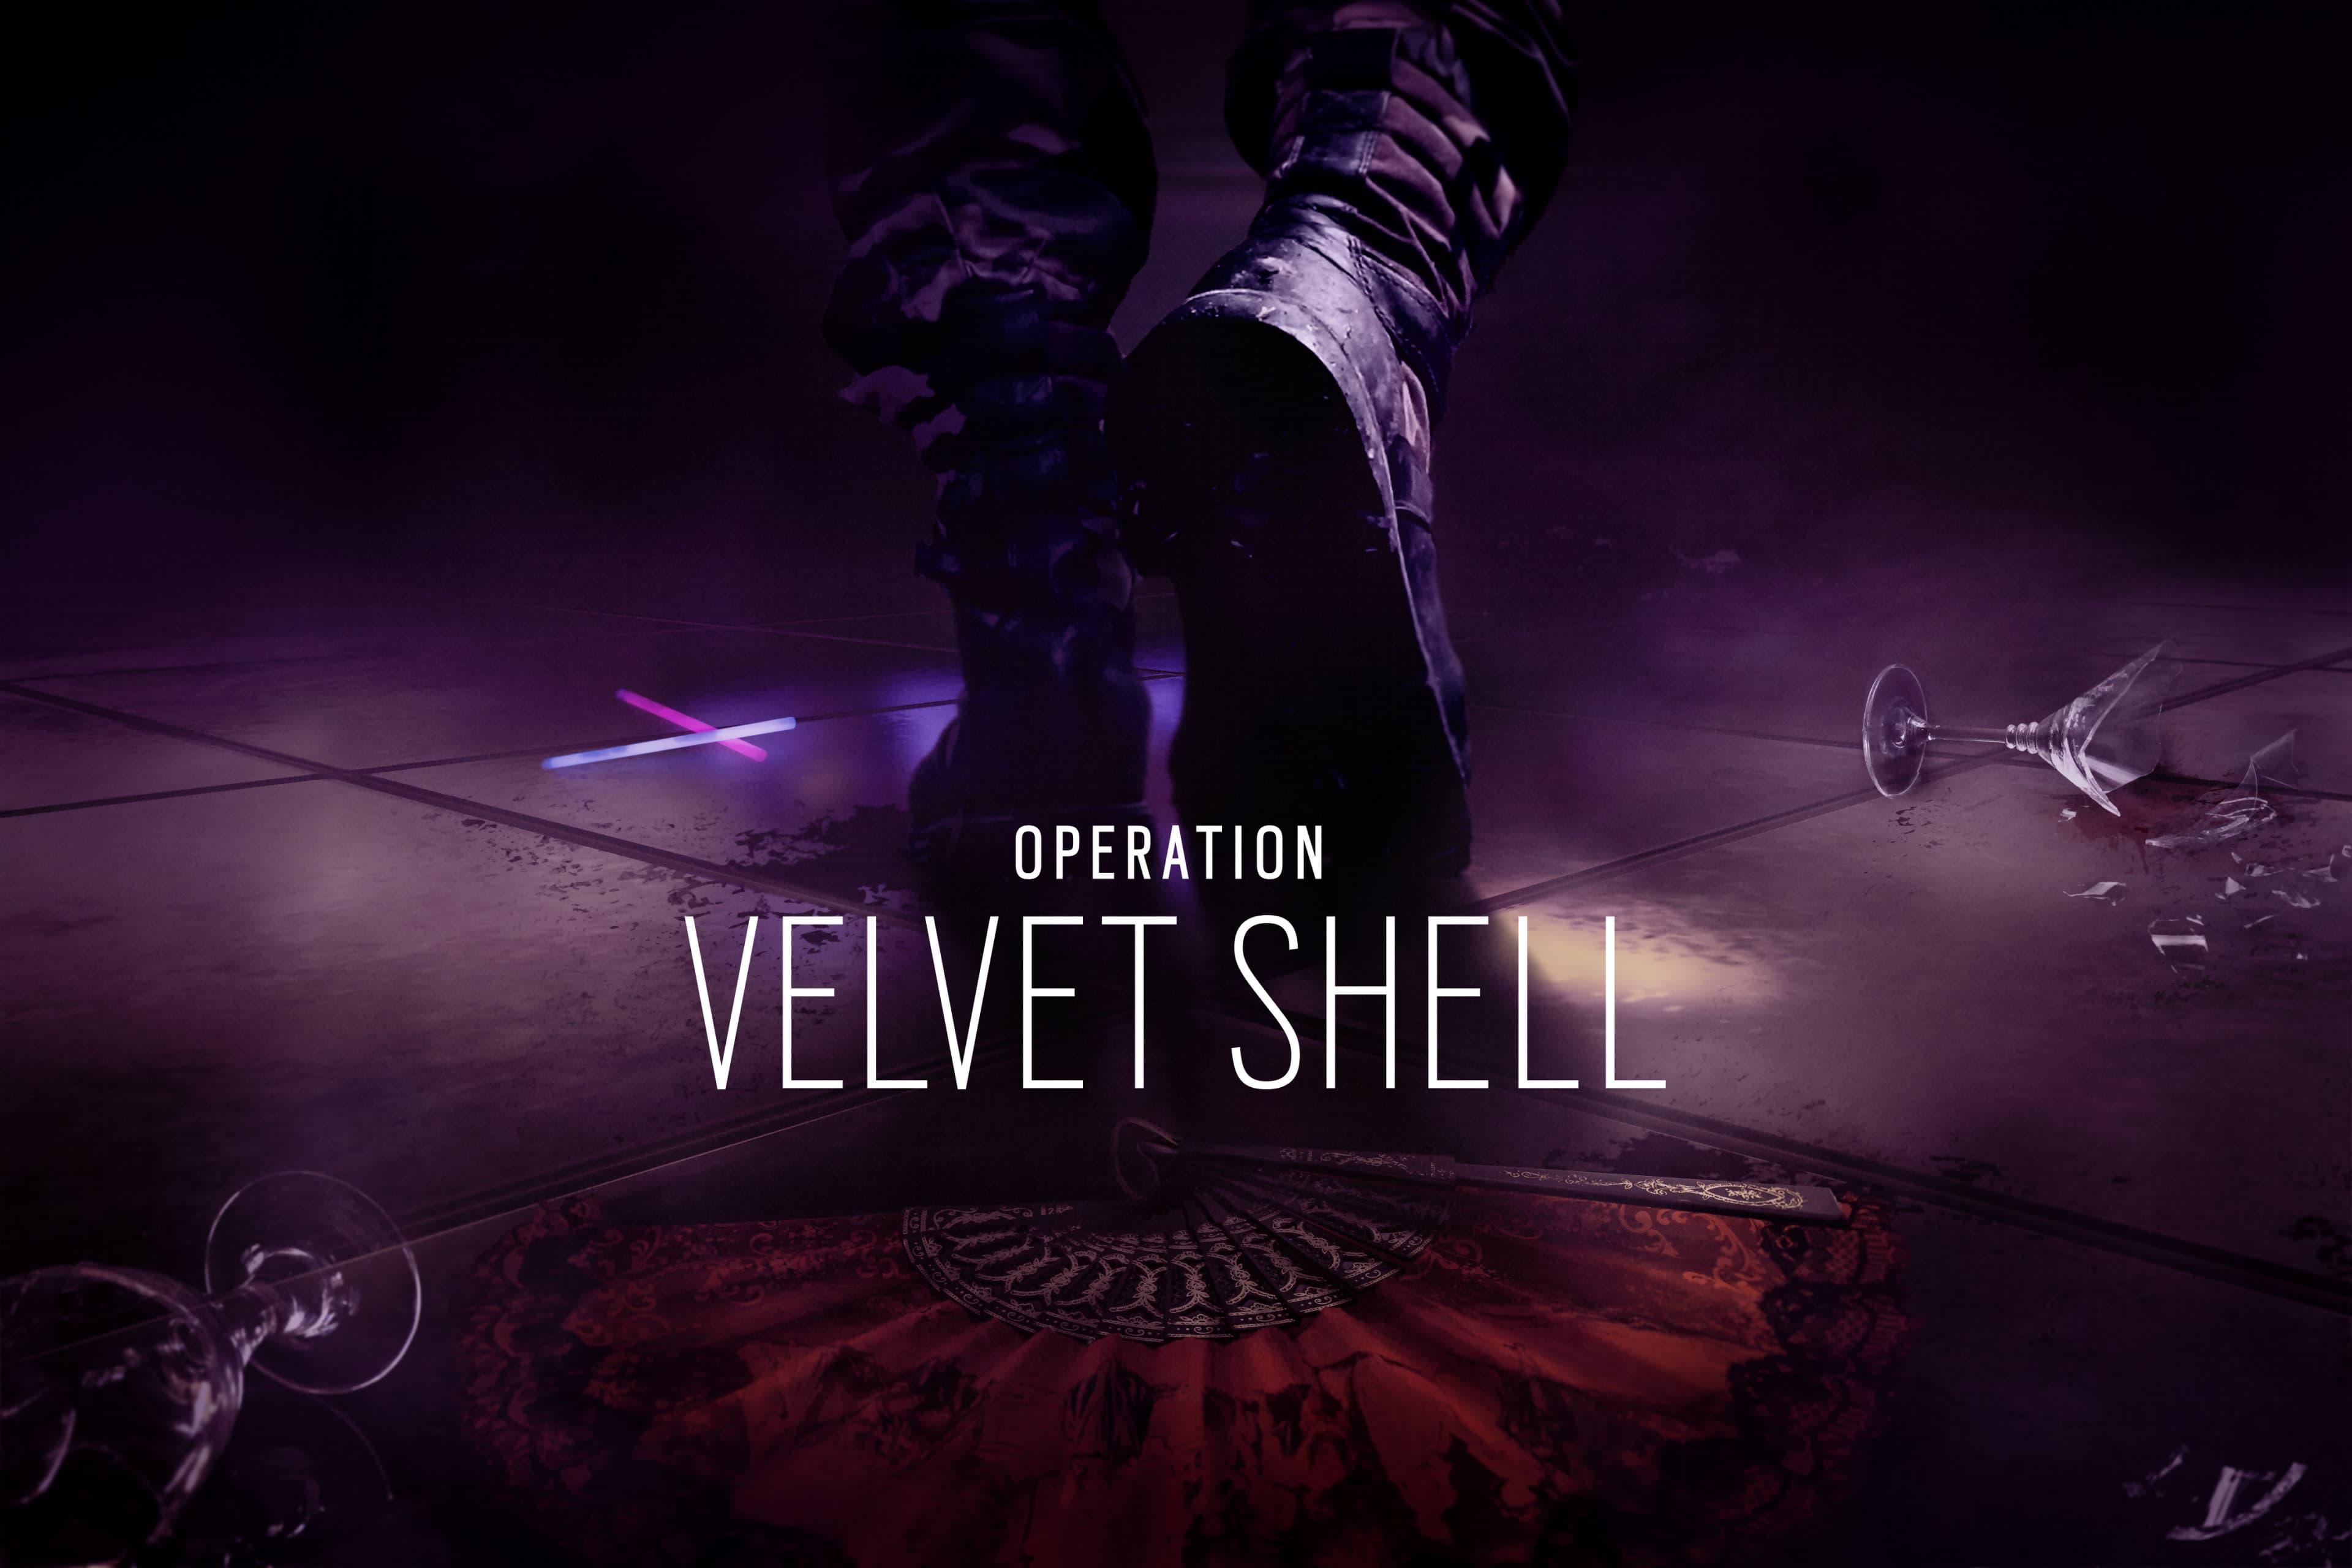 Xbox One Tom Clancy's Rainbow Six Siege: Opération Velvet Shell